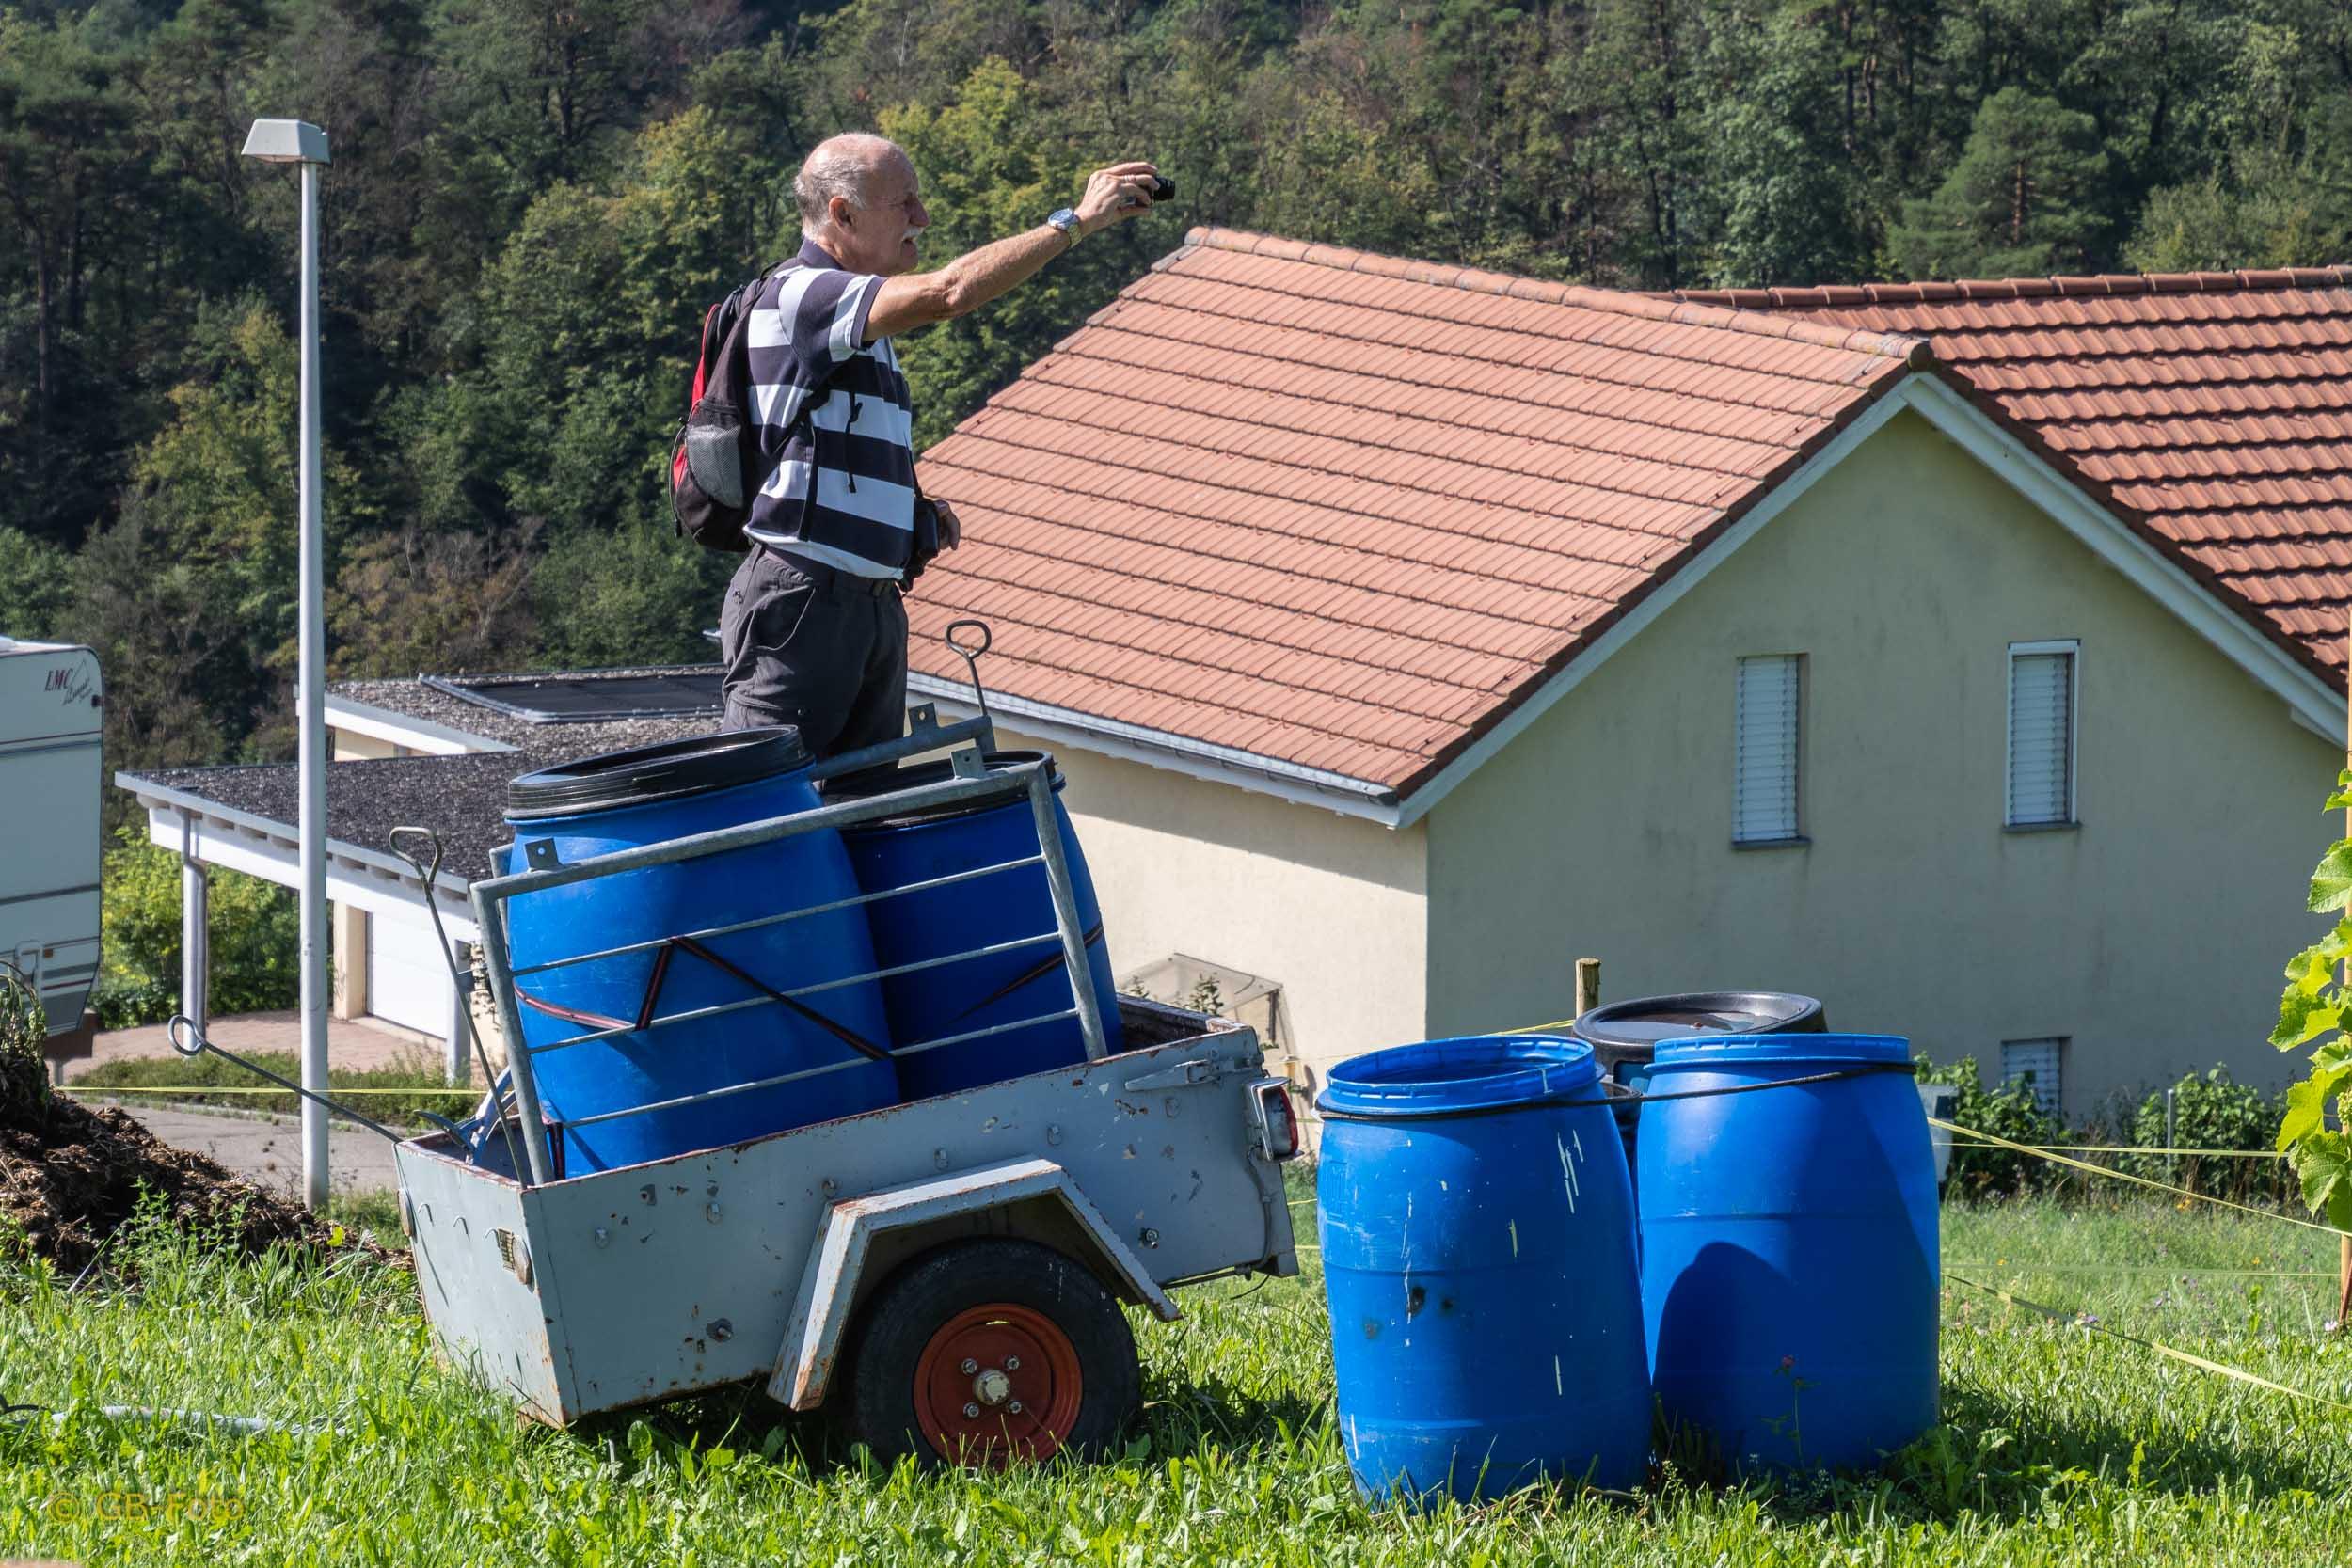 Seniorenwanderung Liesberg - Kleinlützel 08.08.2019